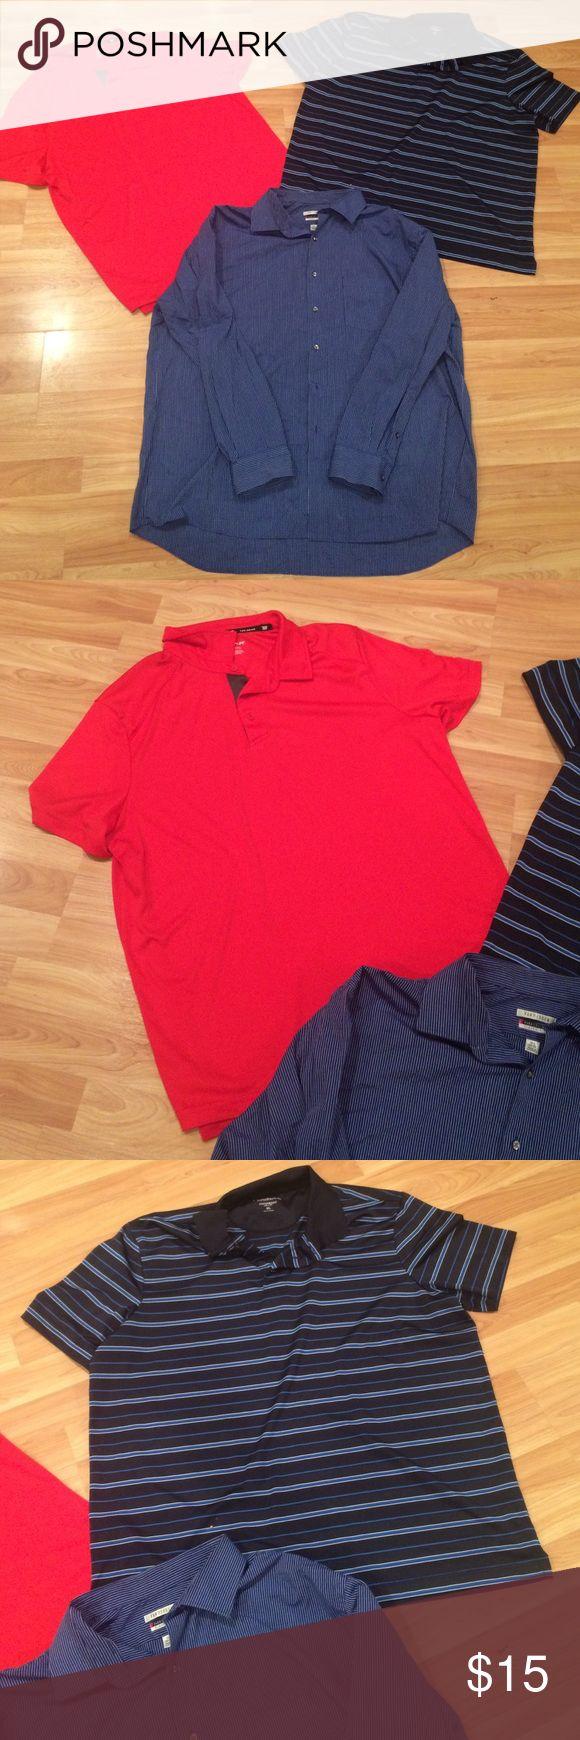 Men's XL shirt bundle! Dress shirt 16.5 neck 34/35 - Polos size xl and all are excellent! Shirts Dress Shirts